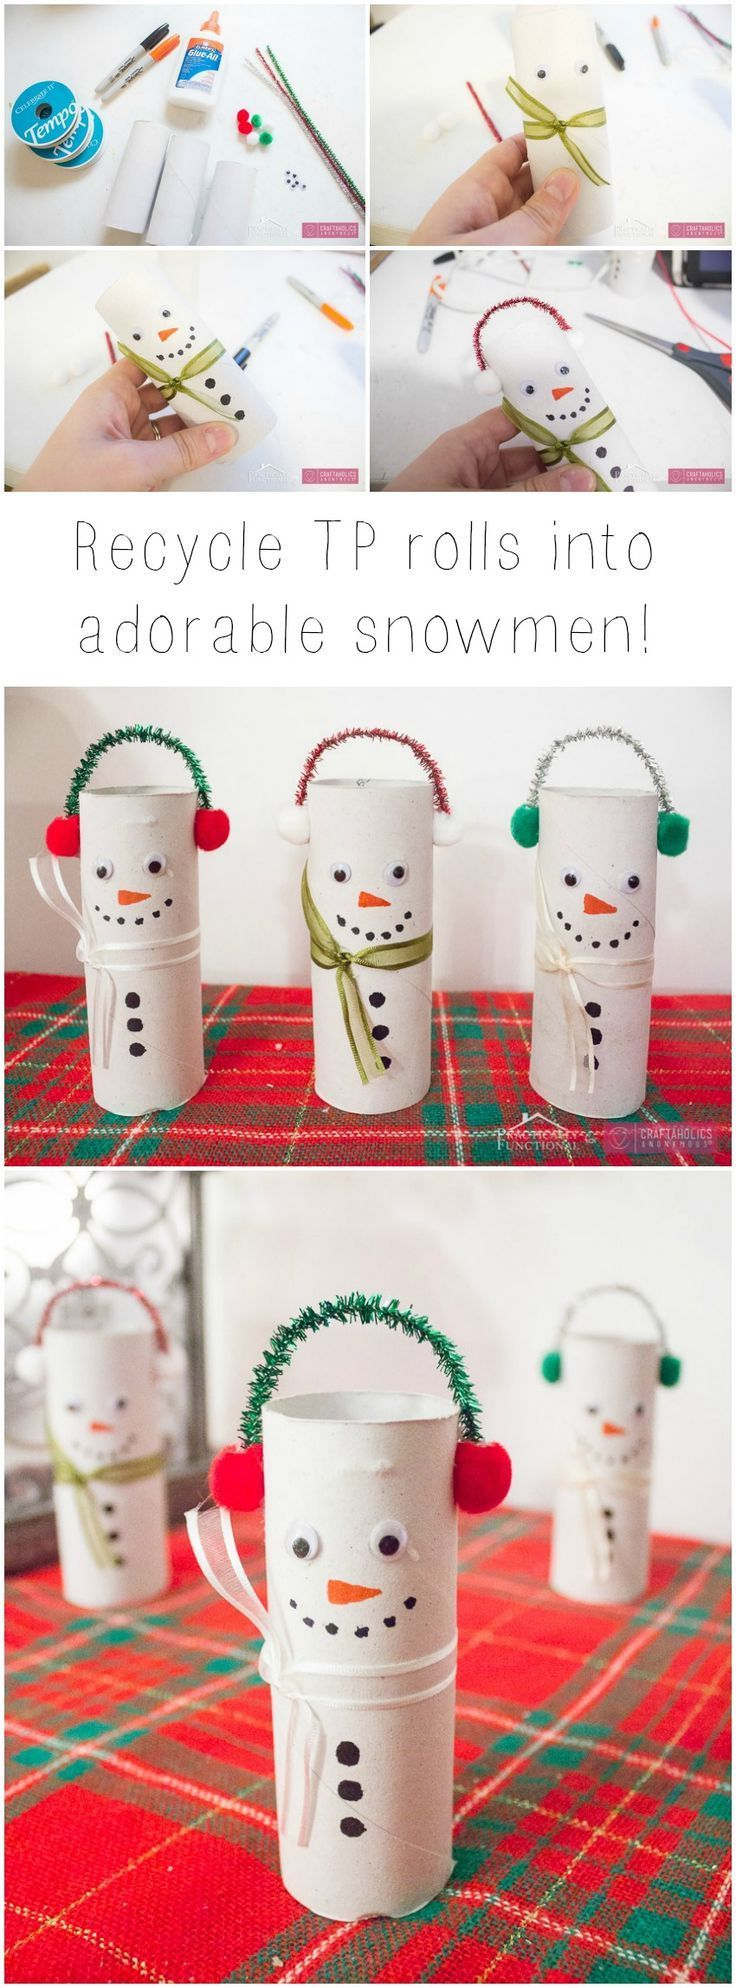 DIY Toilet Paper Roll Snowmen | Pinterest | Toilet paper roll ...